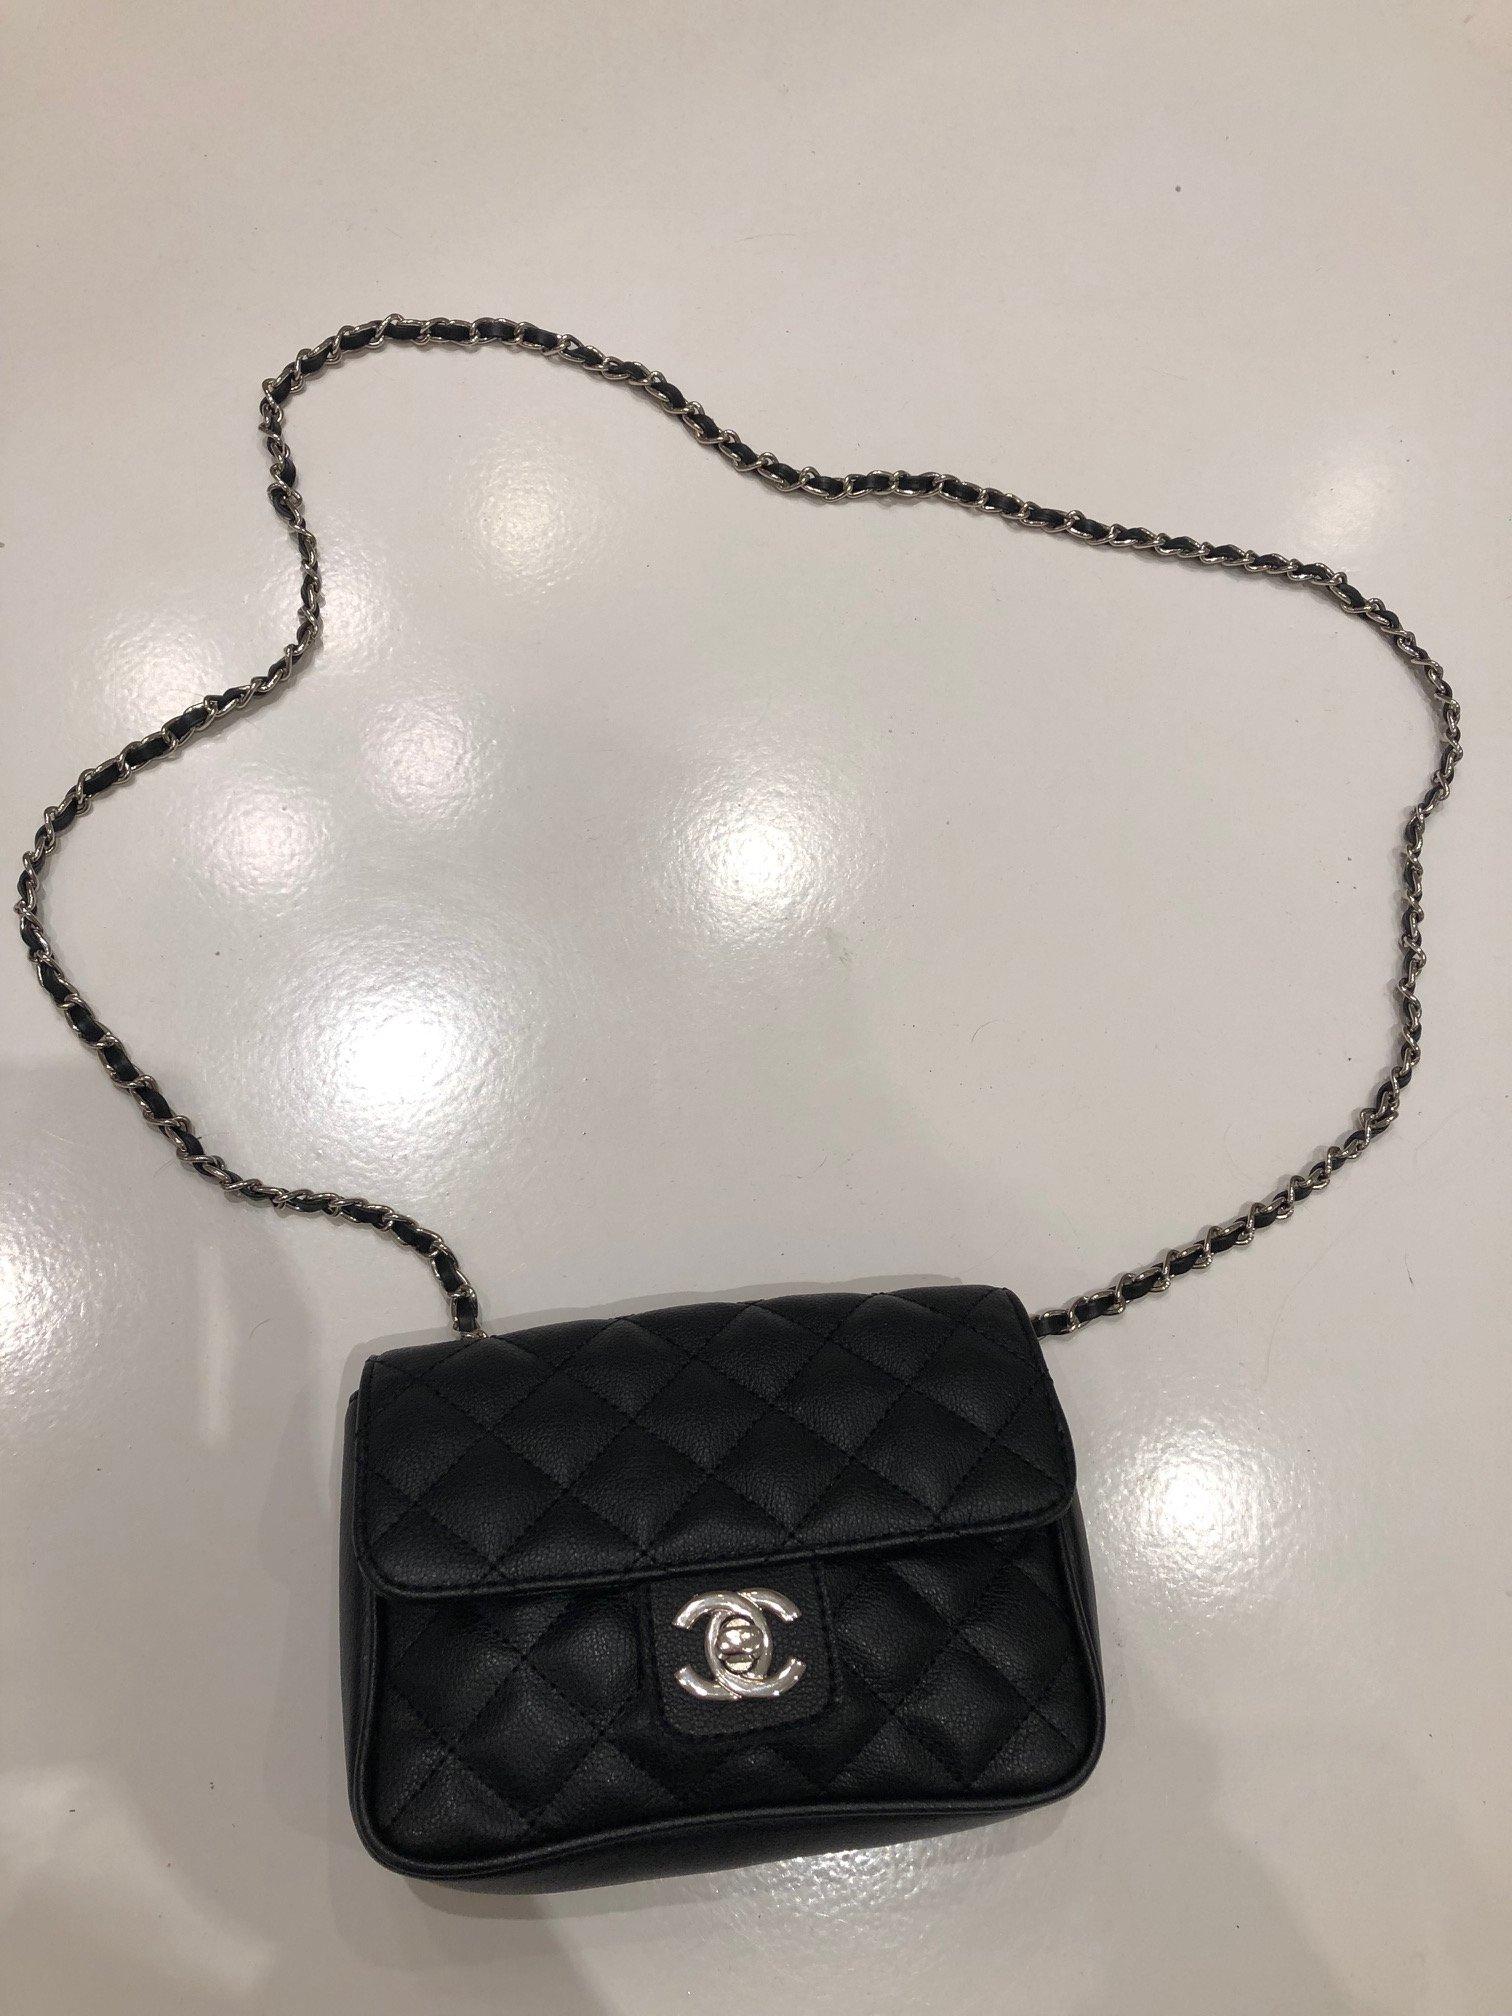 cdbc9679cb371 Super torebka Chanel, mała elegancka! - 7220954028 - oficjalne ...